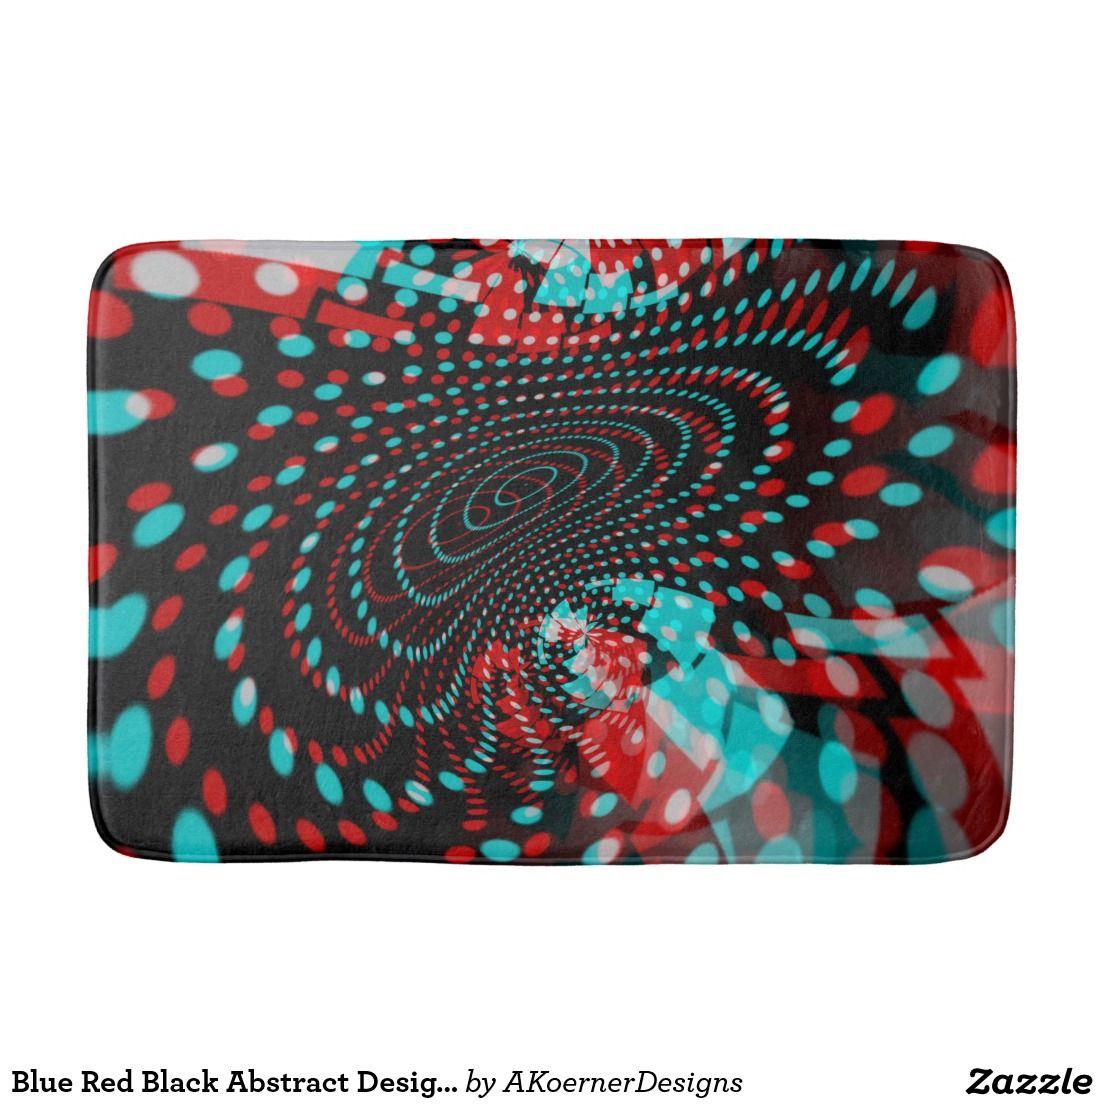 Blue Red Black Abstract Design Bath Mat